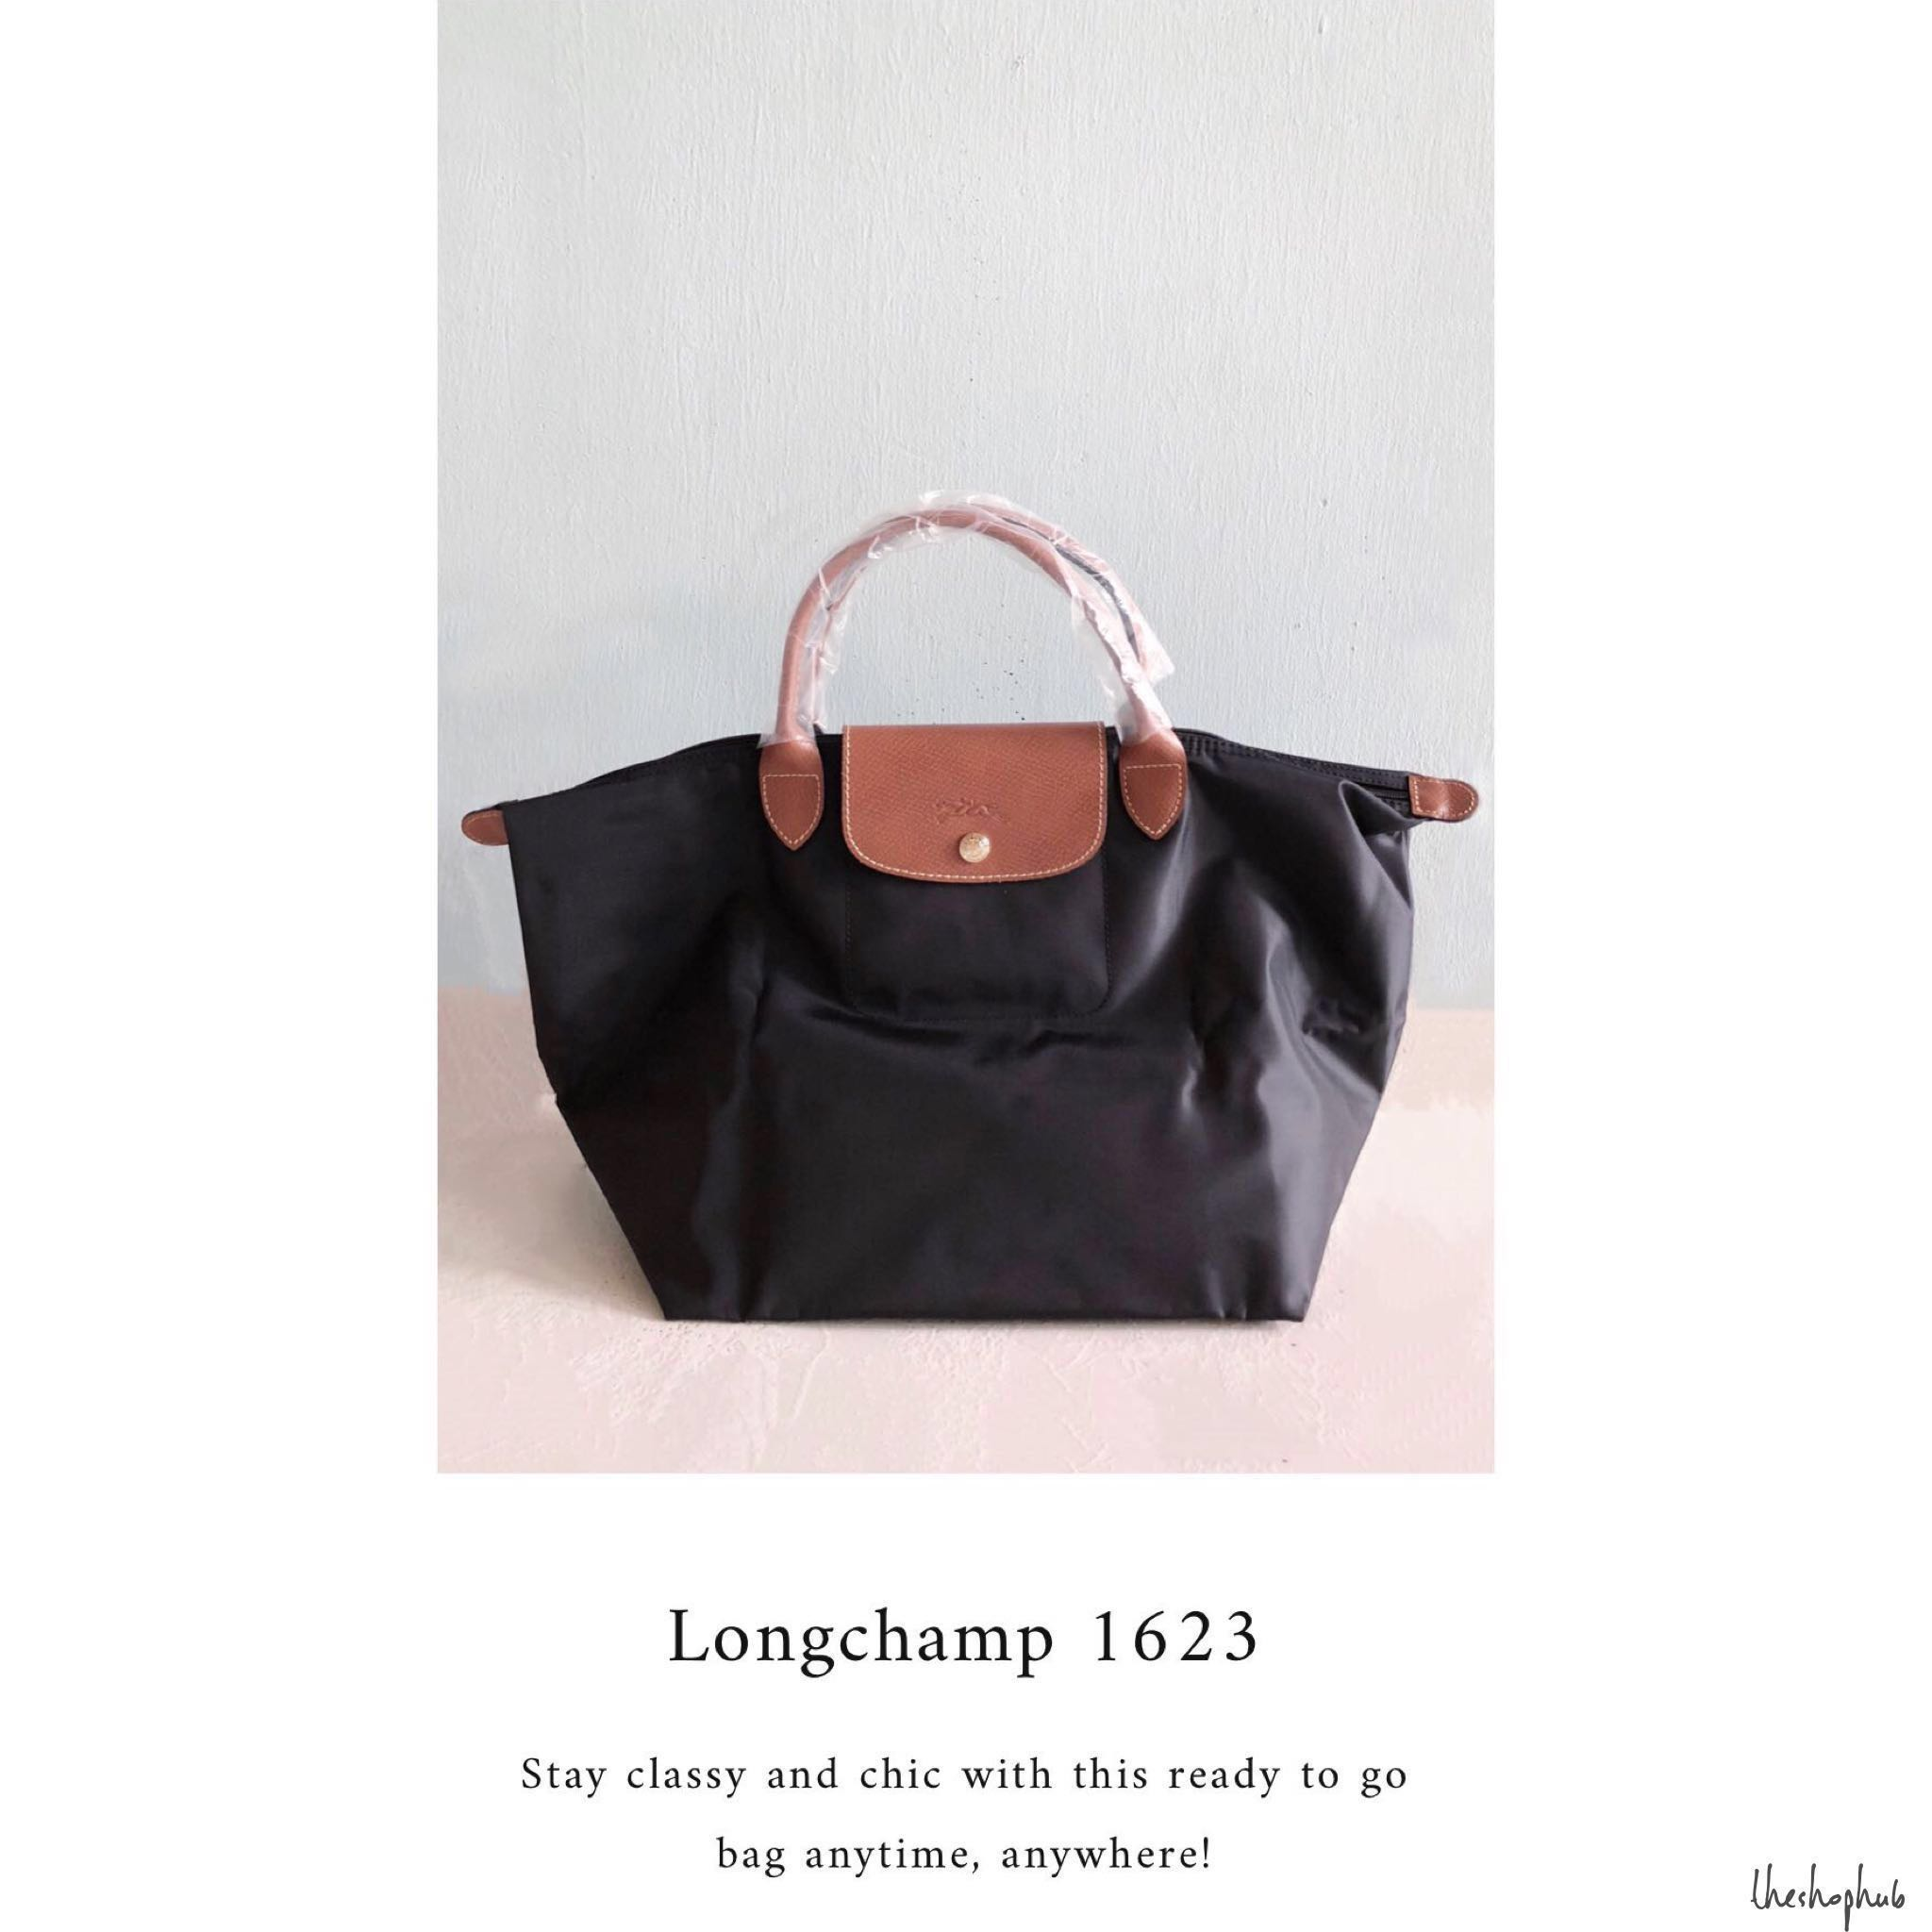 4c15ea25774  CHEAPEST  Authentic + New Longchamp Le Pliage Handbag BLACK MEDIUM,  Women s Fashion, Bags   Wallets, Handbags on Carousell